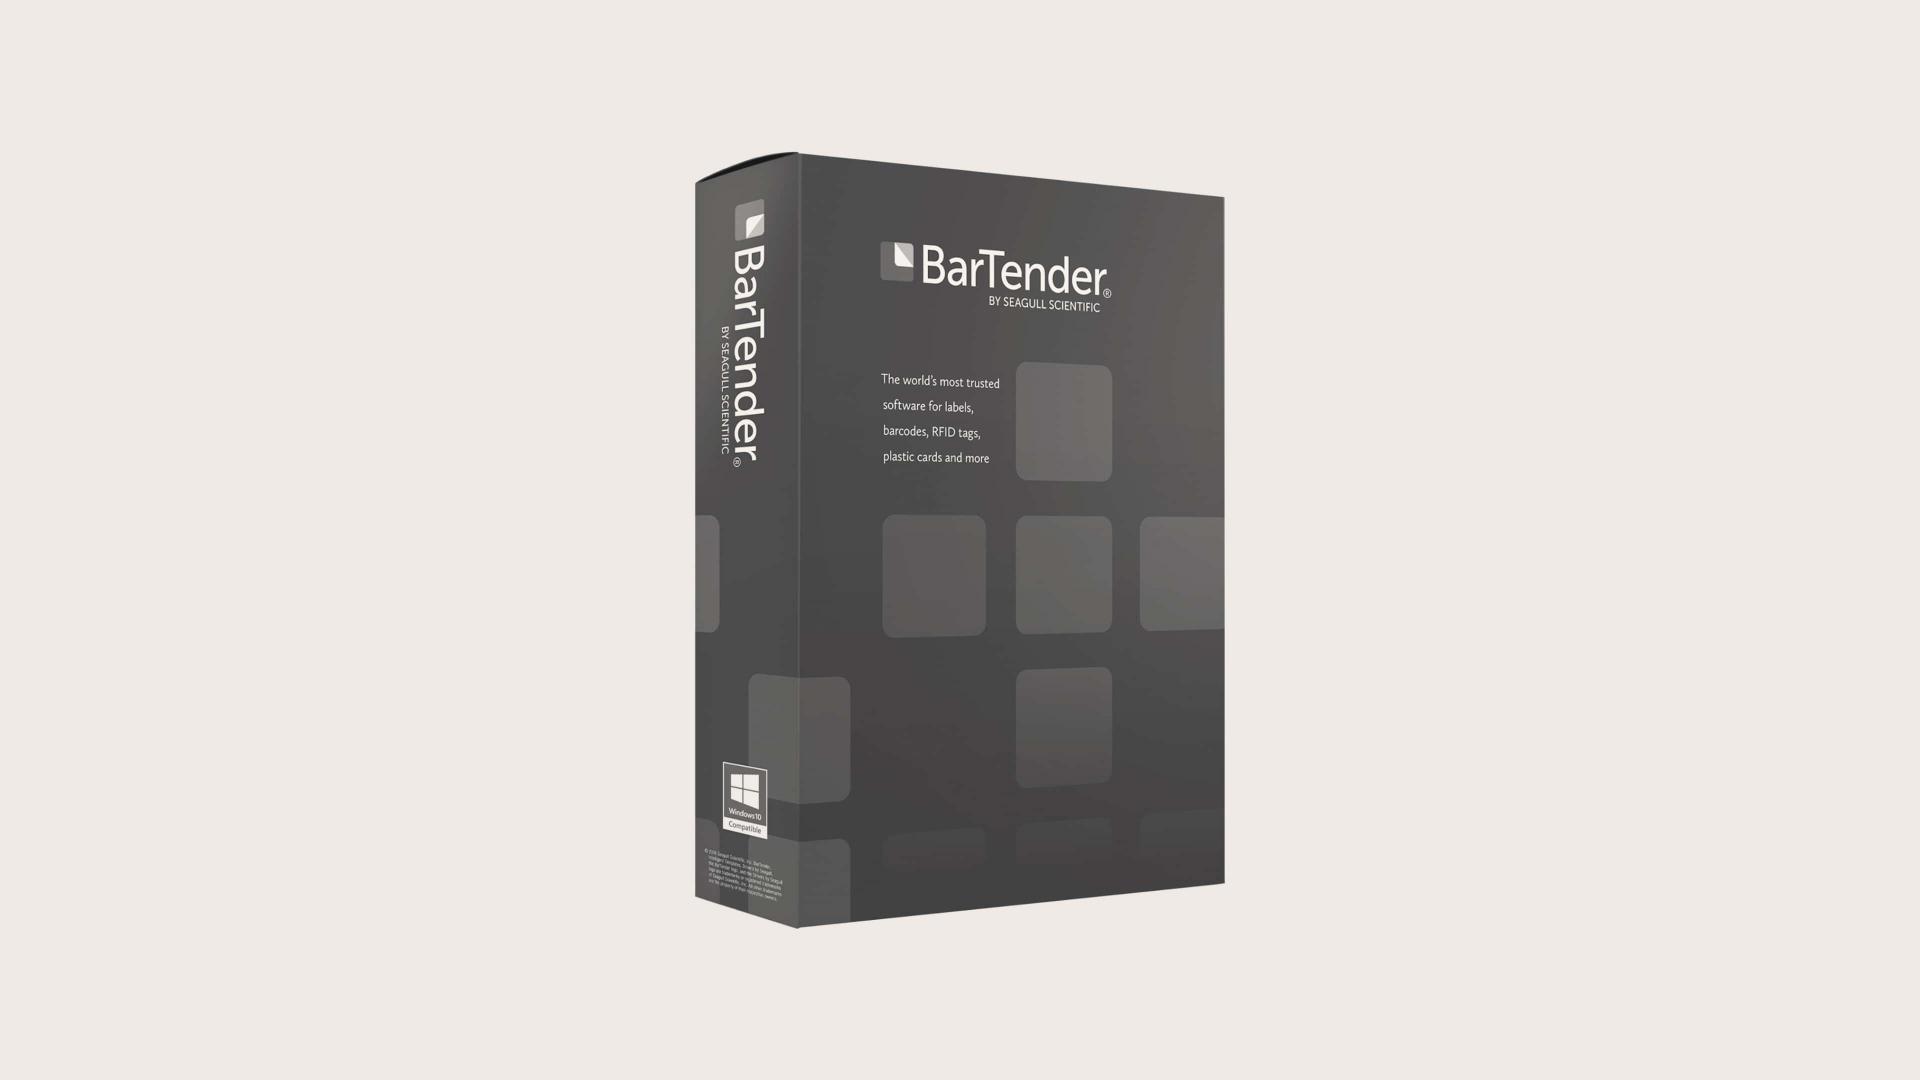 Bartender Professional Edition Programvara Etikettdesign